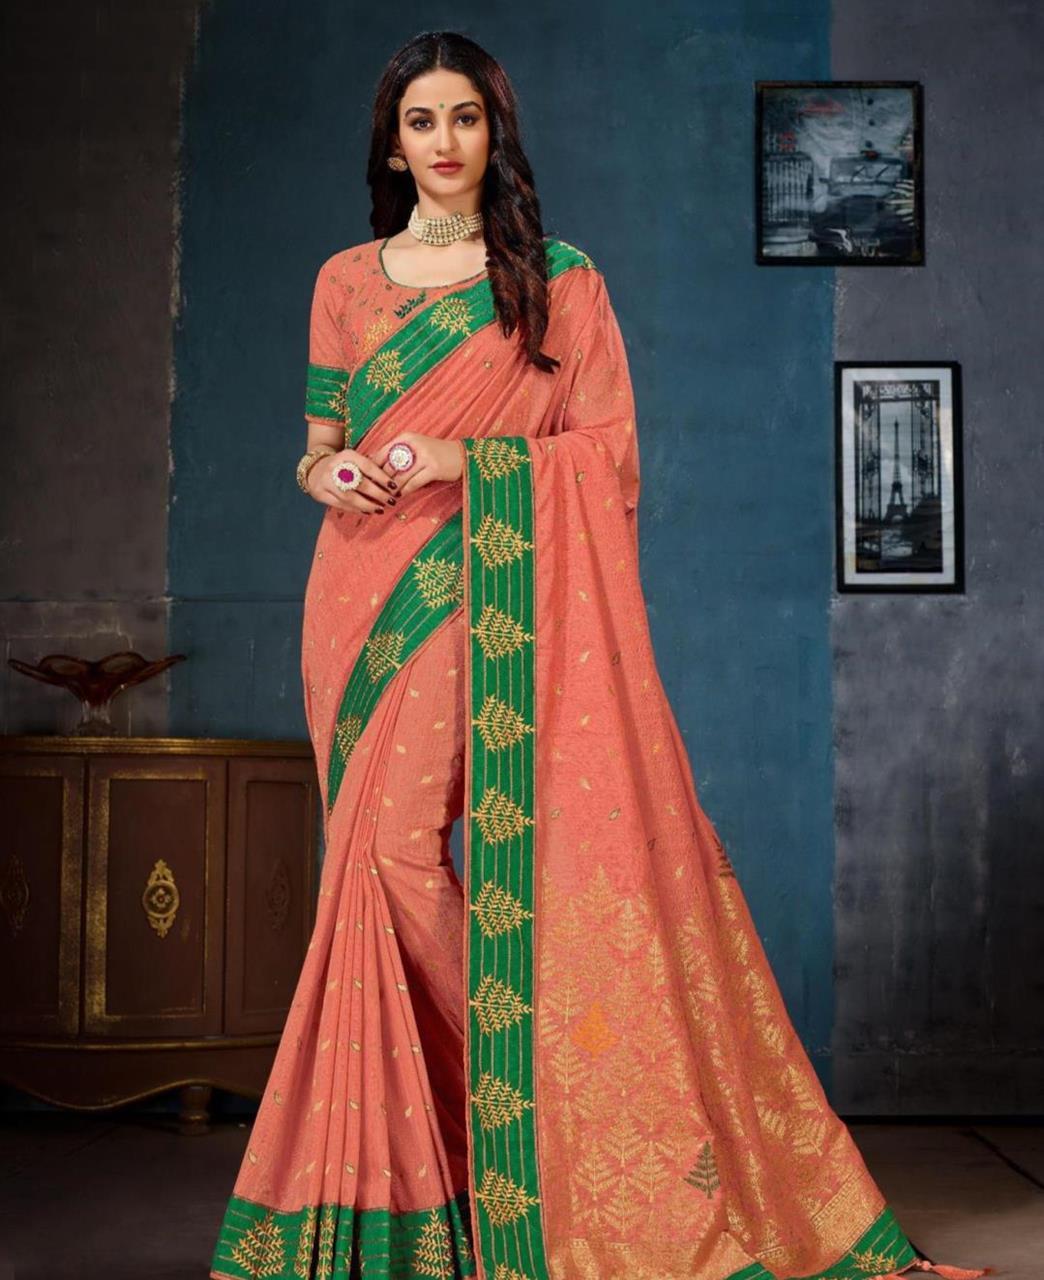 Jacquard Cotton Saree (Sari) in PeachPuff